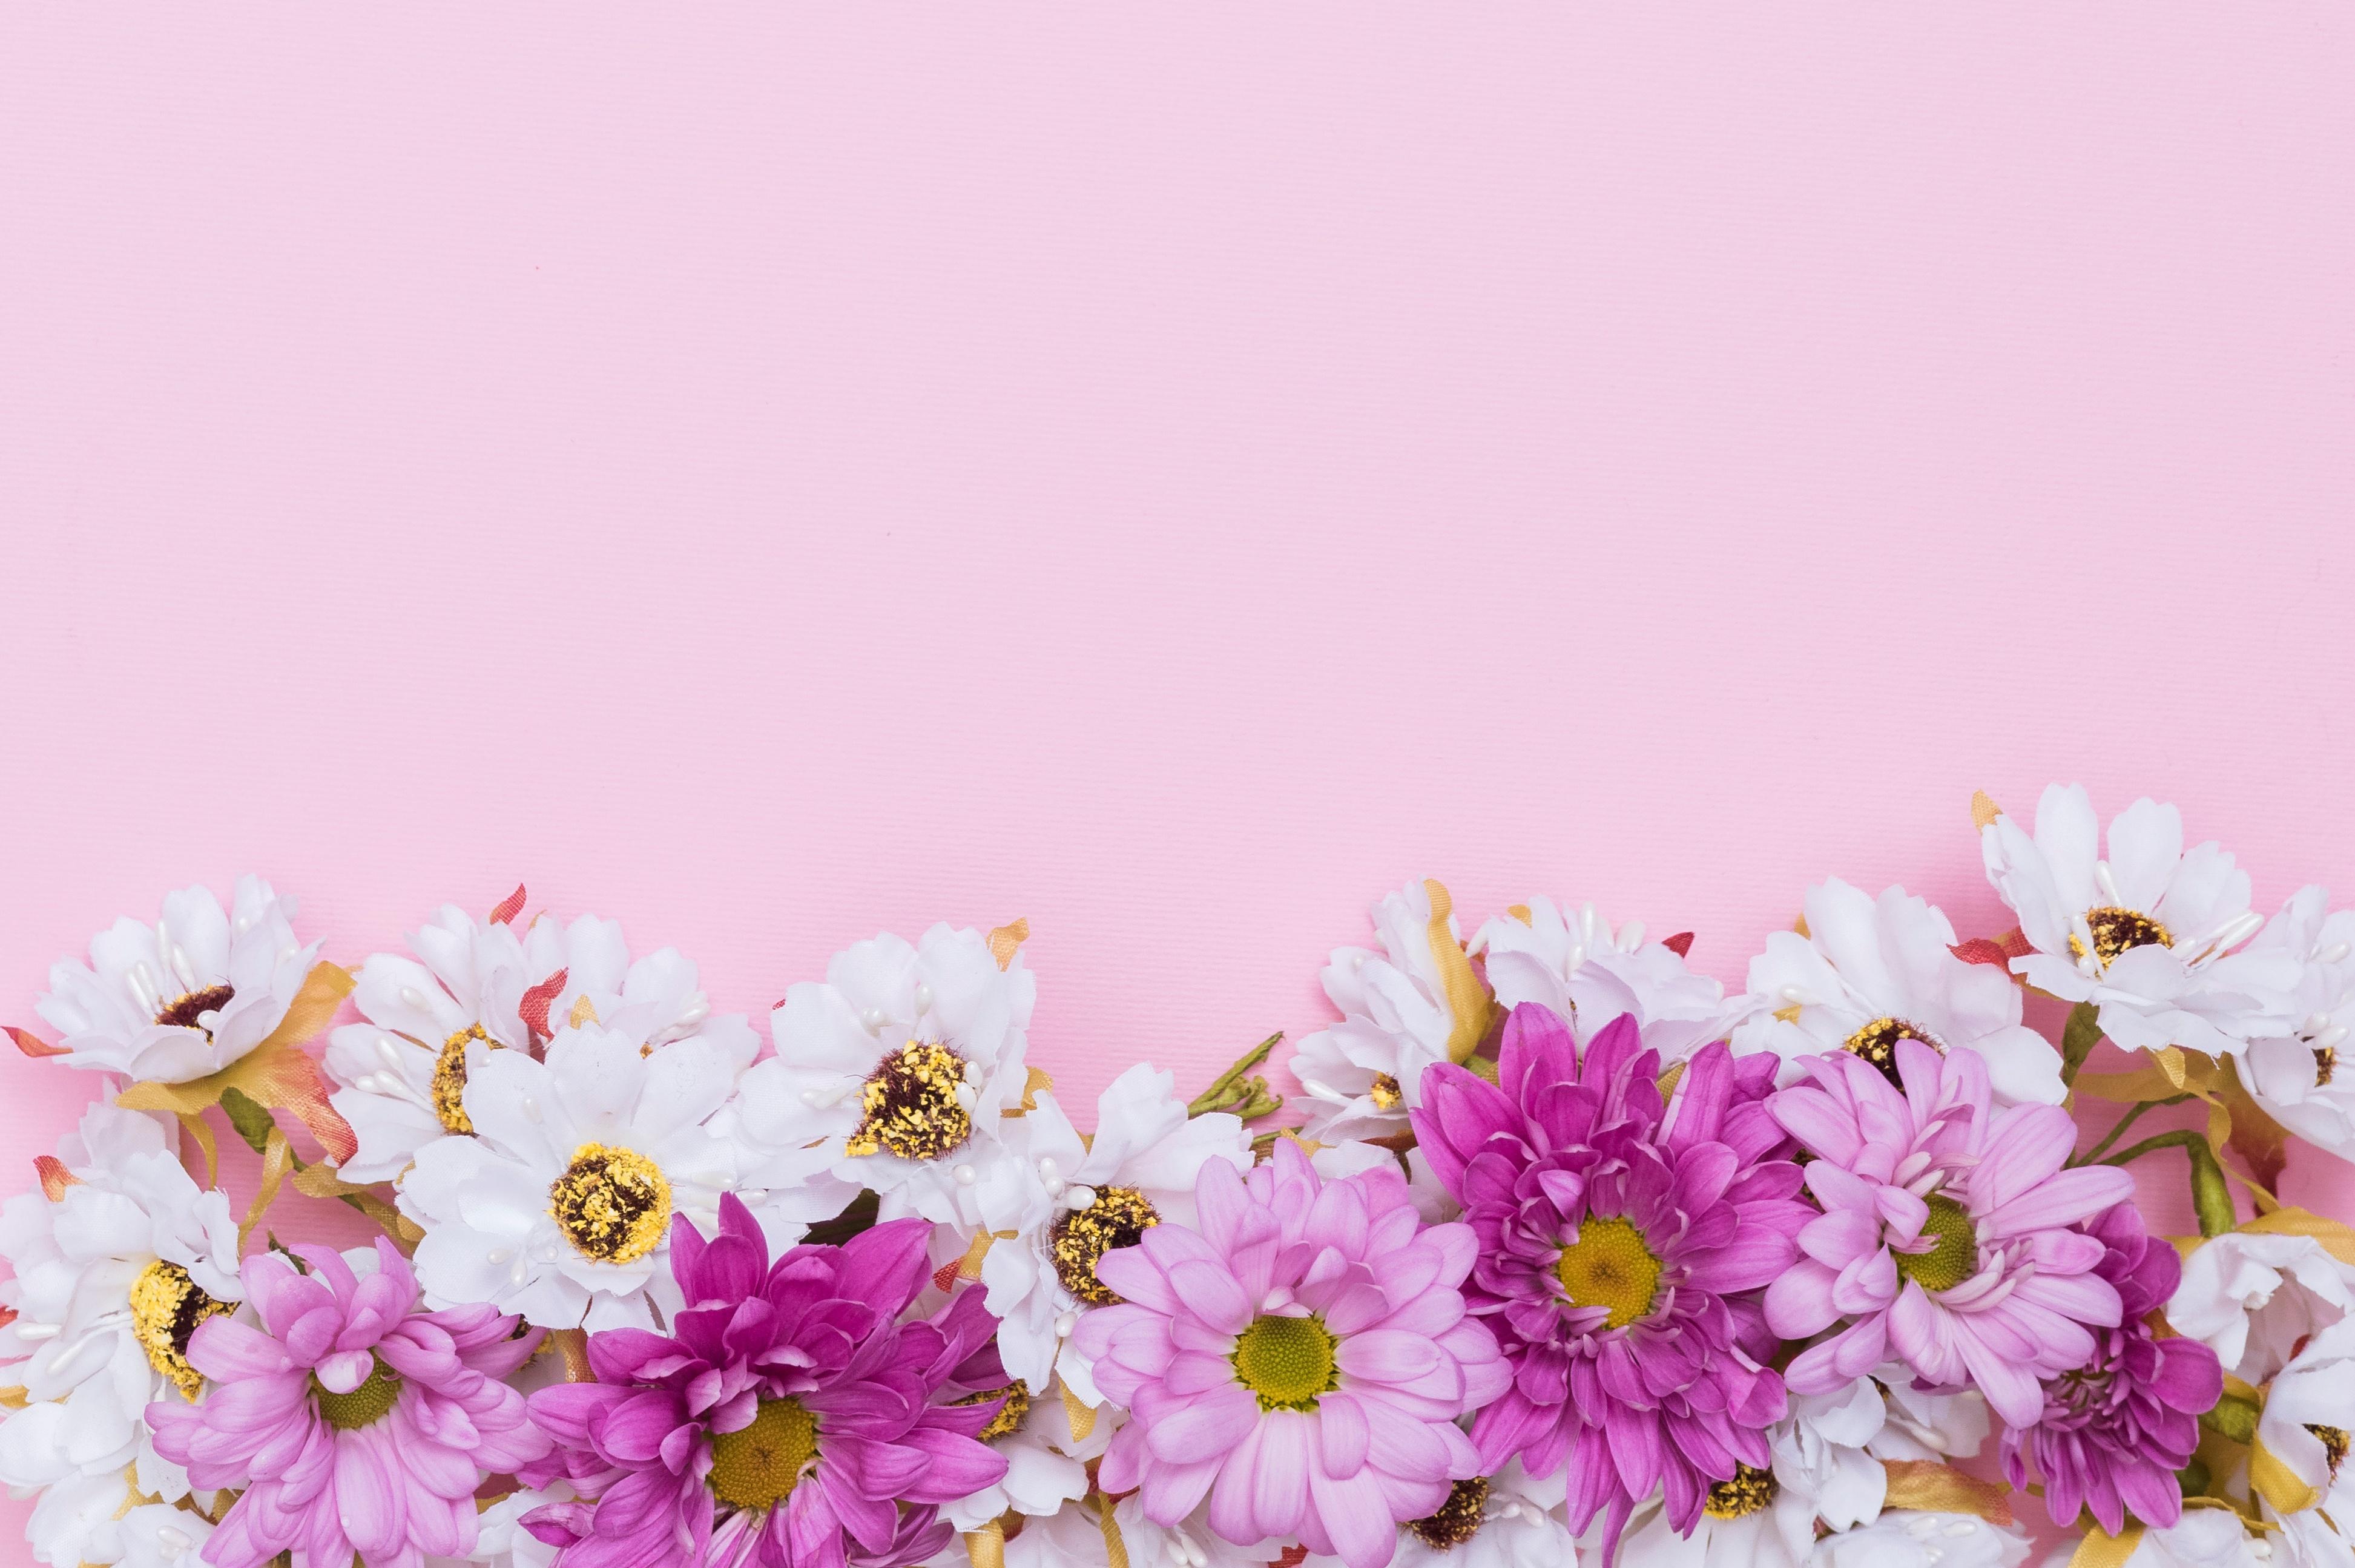 ромашки розовые белые chamomile pink white  № 1038020 без смс